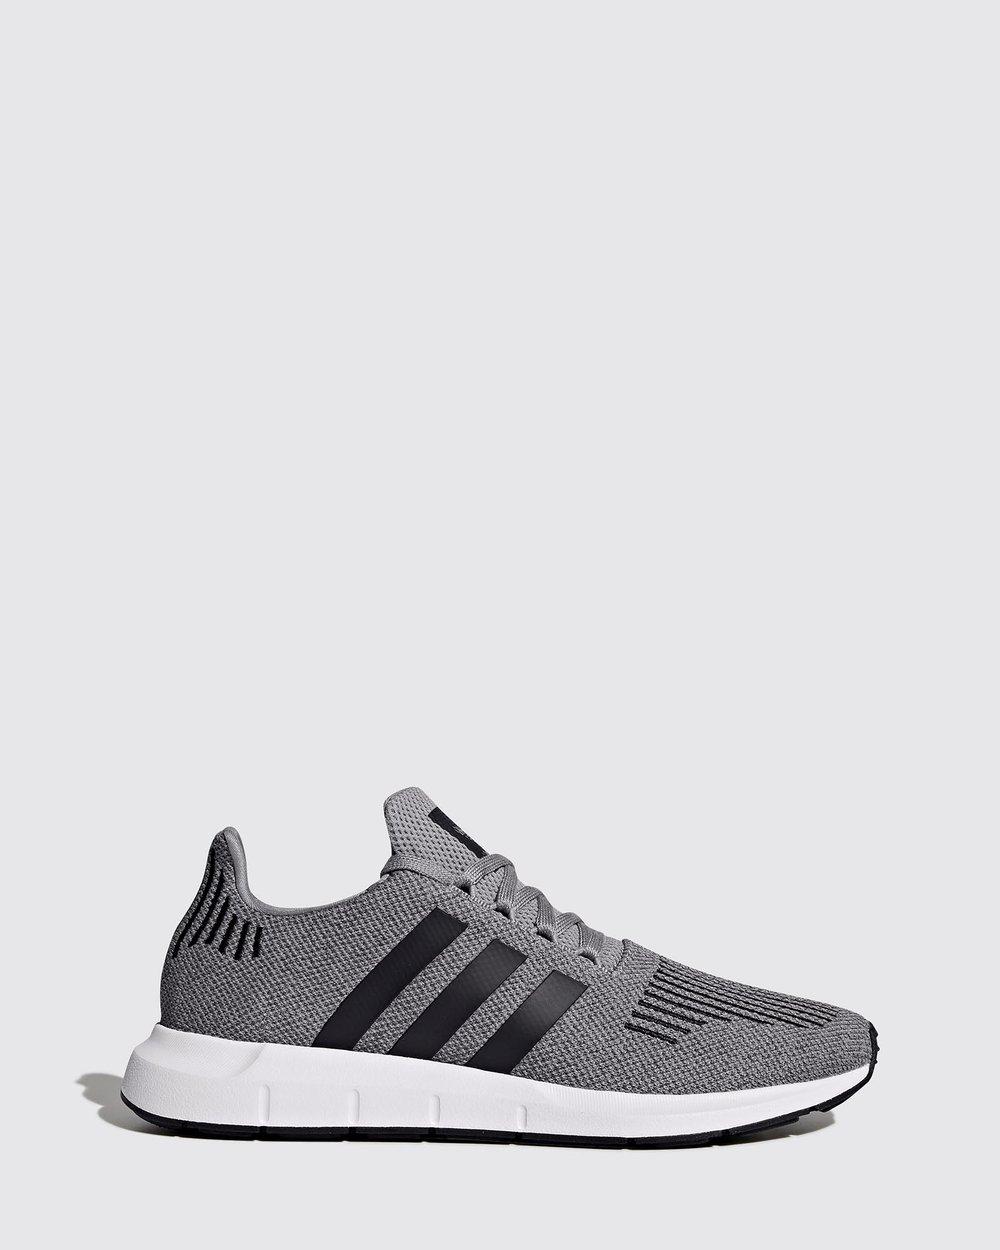 084951166dba Swift Run Shoes by adidas Originals Online